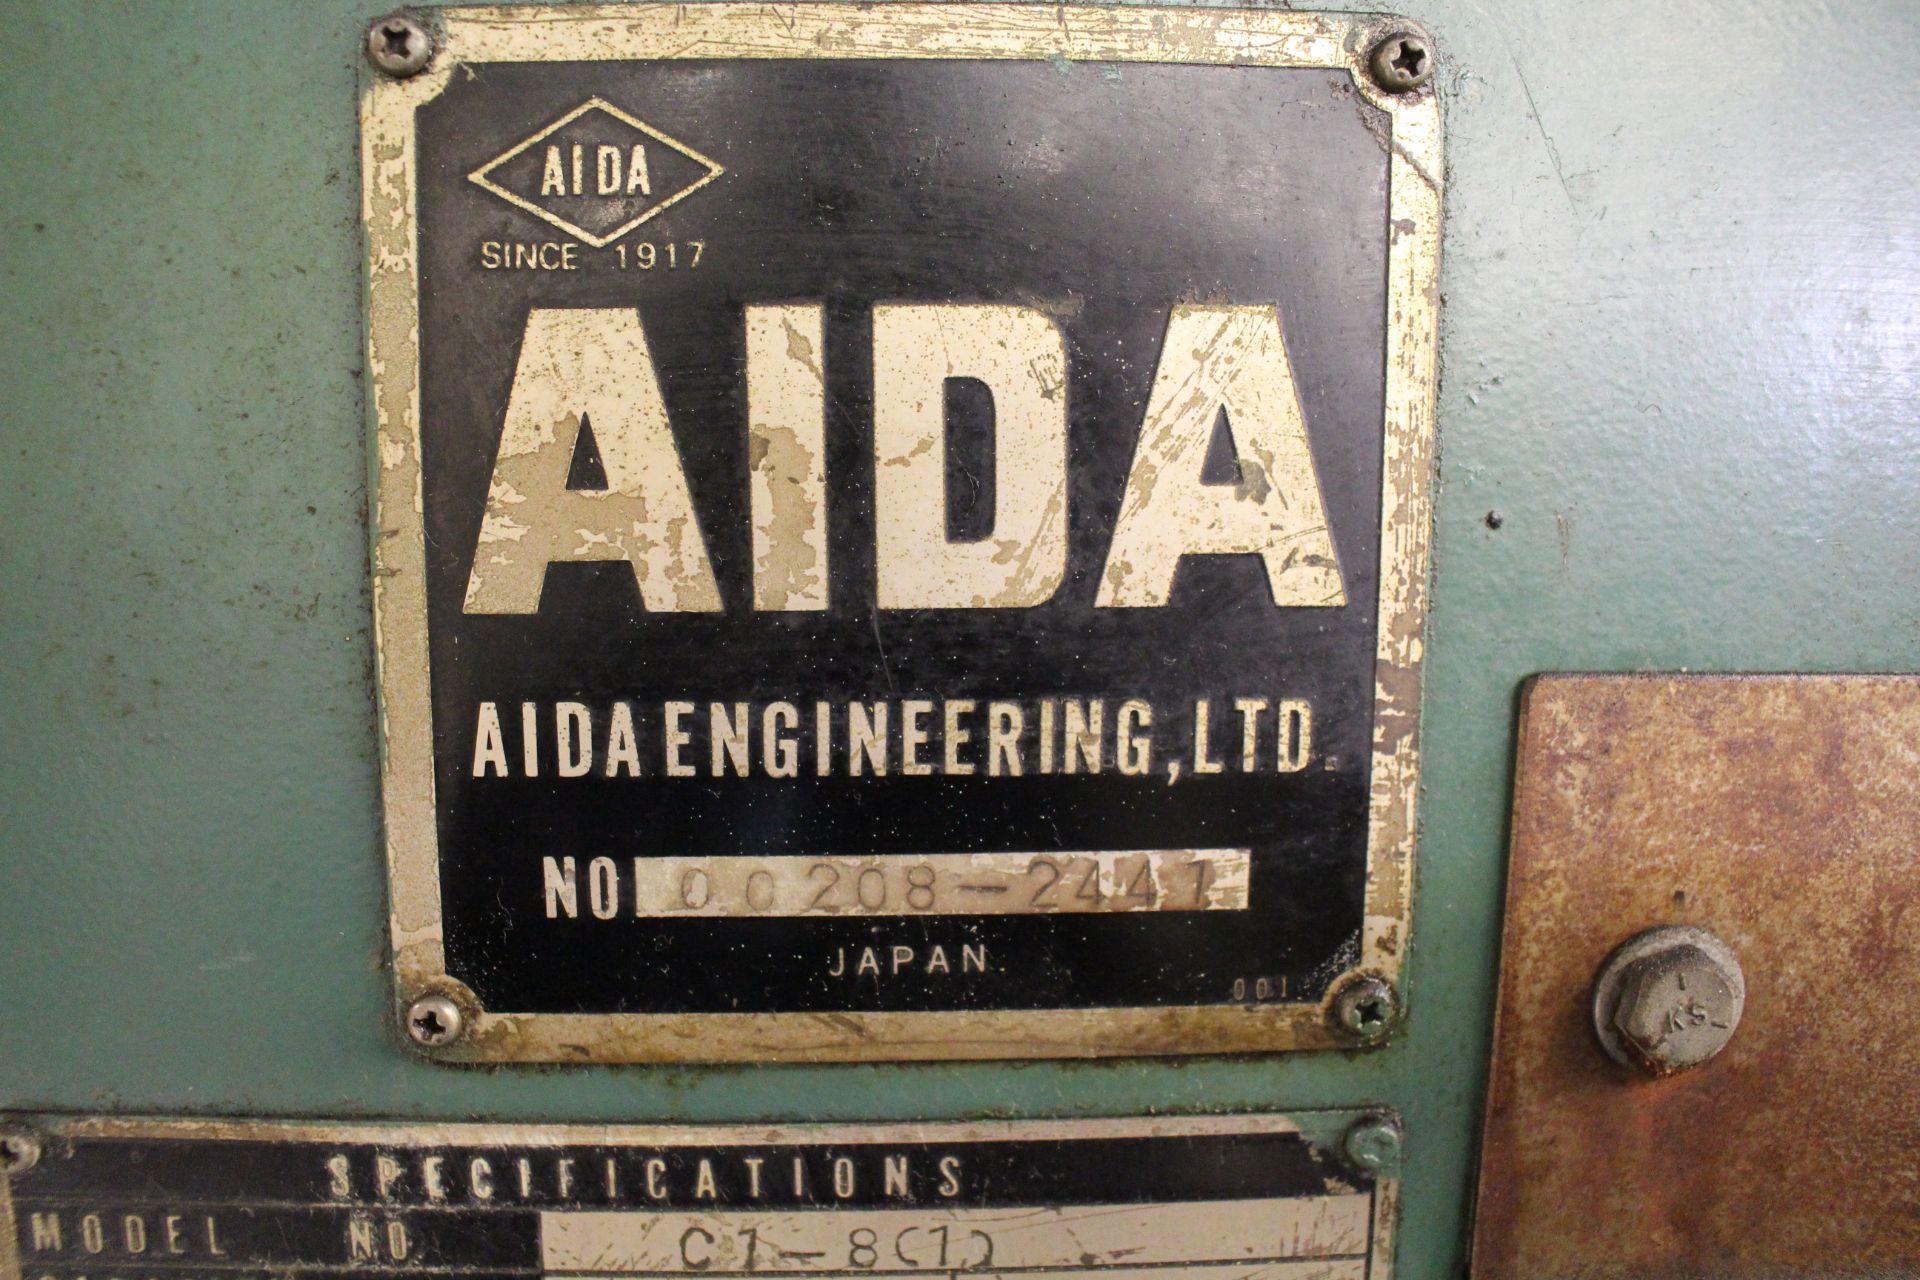 "AIDA MODEL CI-8(1) PUNCH PRESS, 80 TON CAPACITY, 40-155 SPM, 52.36"" X 23.62"" BOLSTER AREA, 21.26"" - Image 10 of 10"